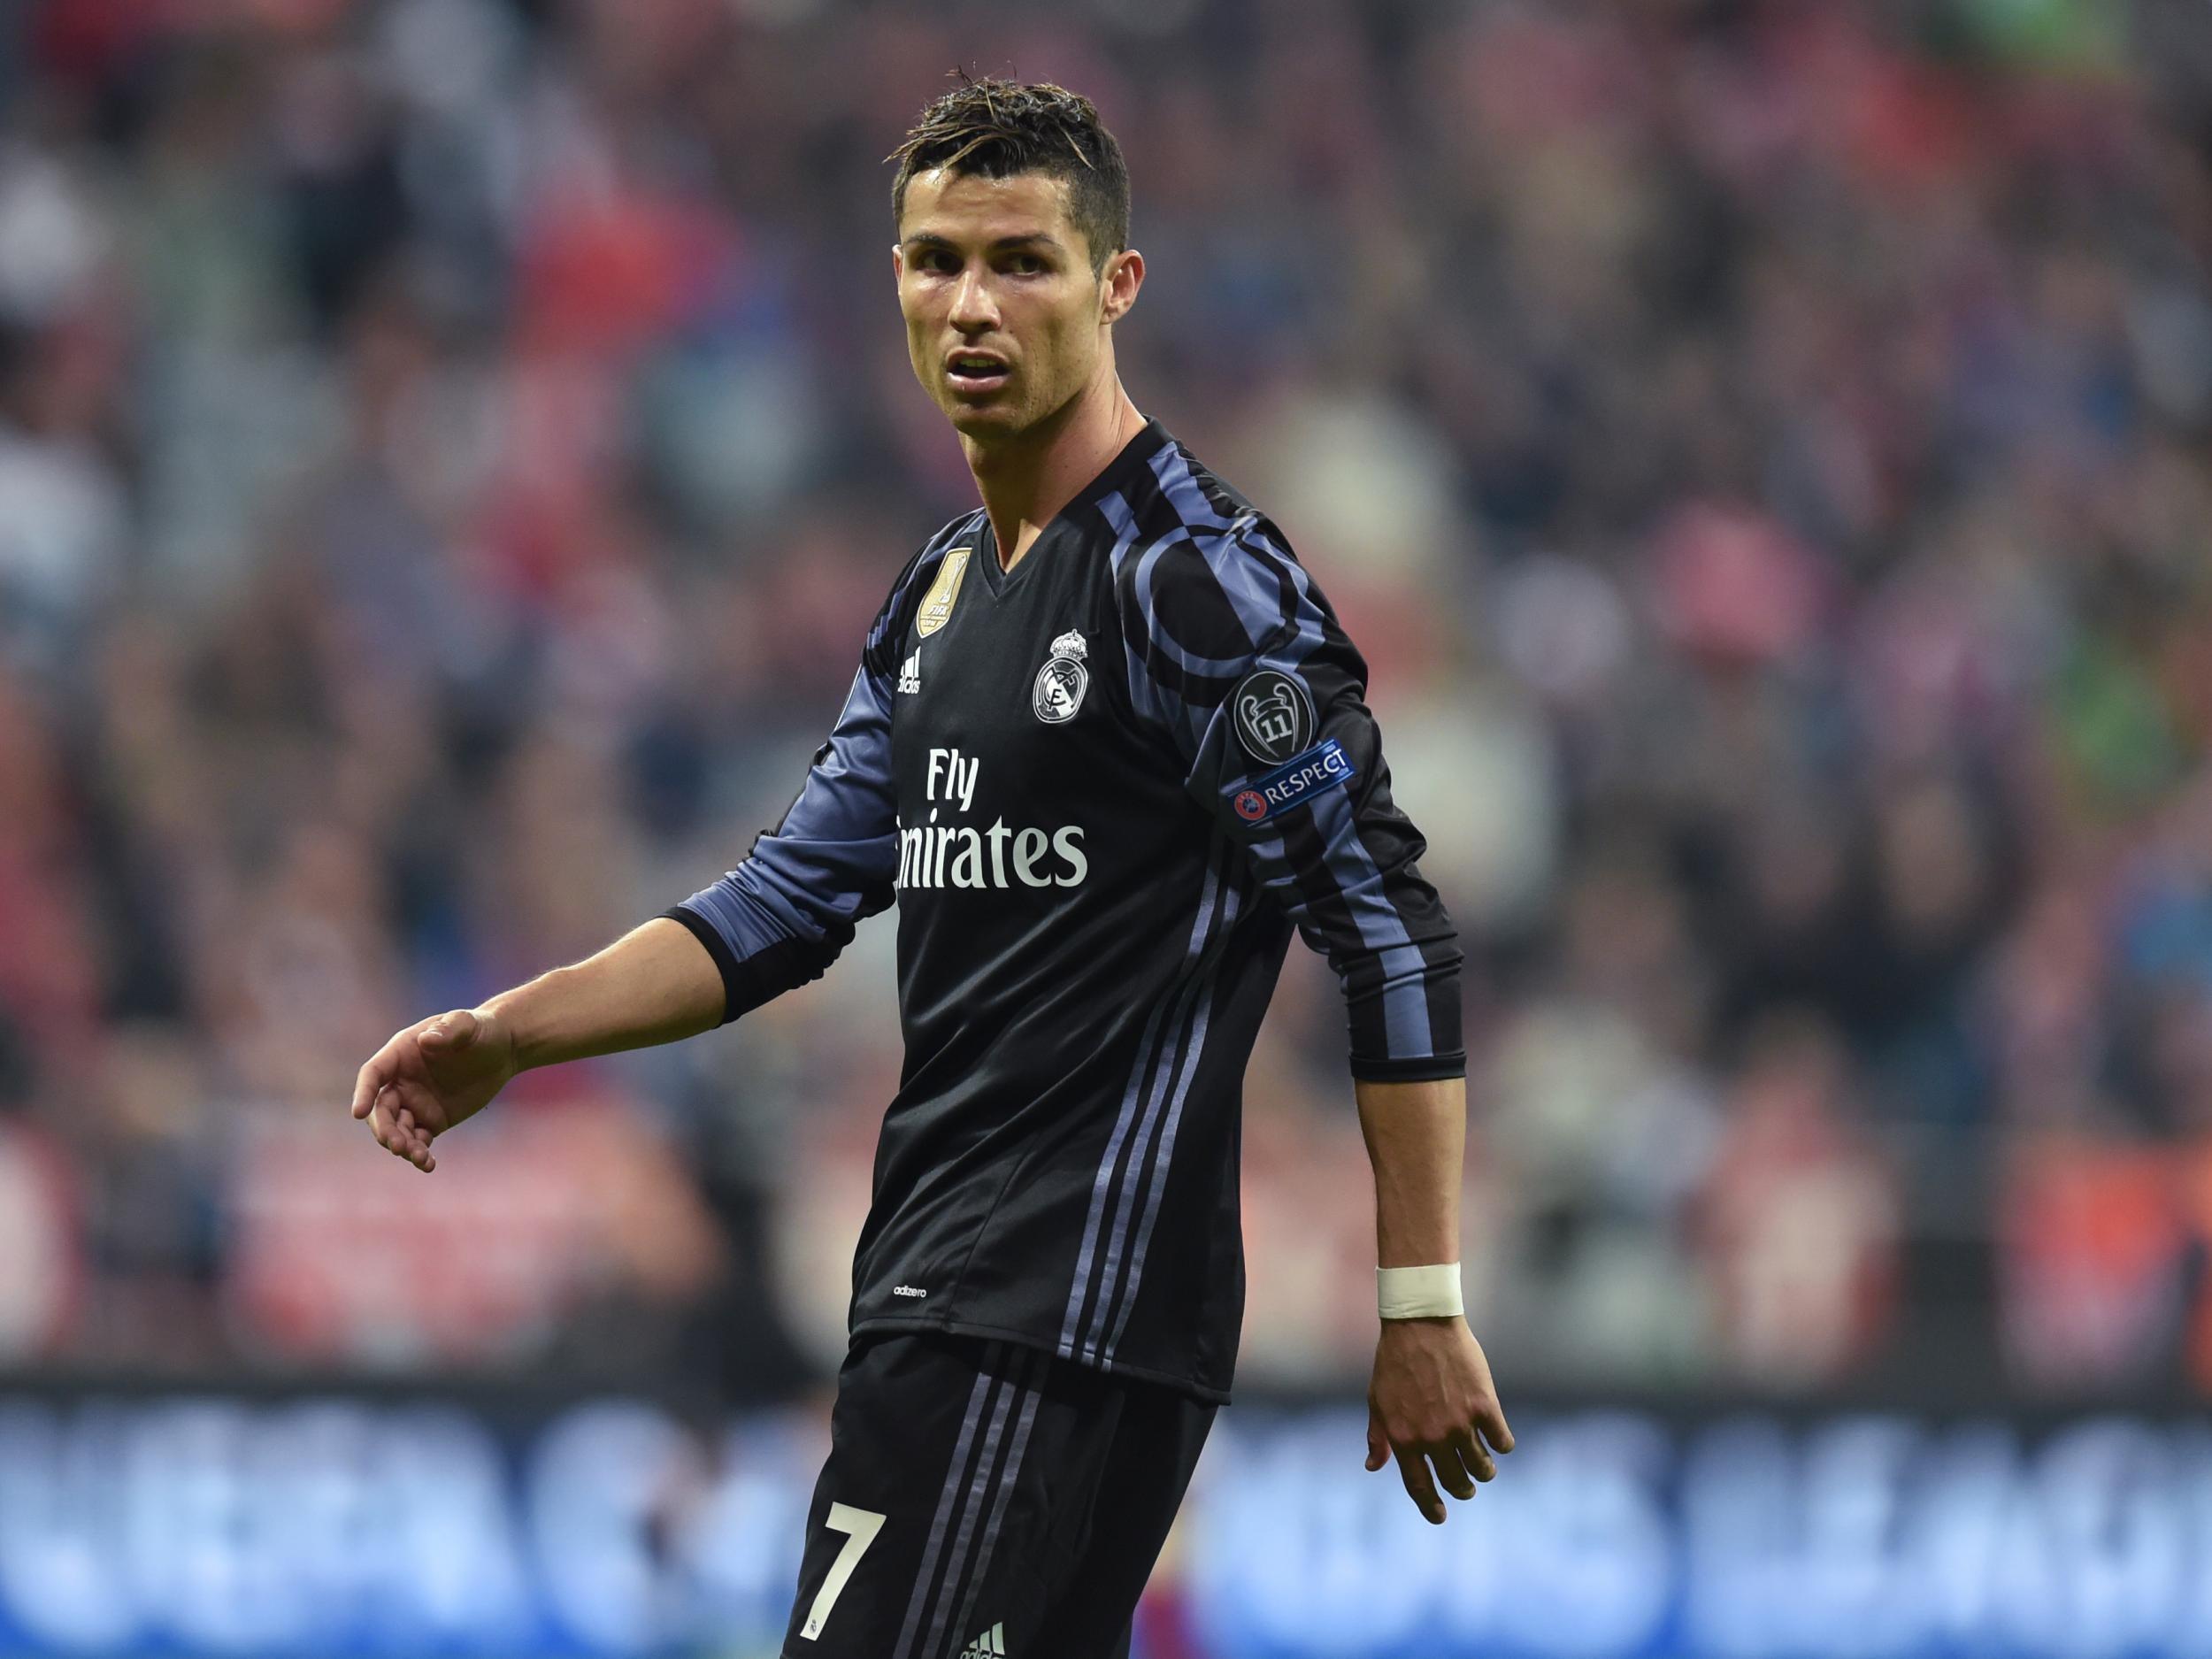 Cristiano Ronaldo representatives strongly deny rape allegations